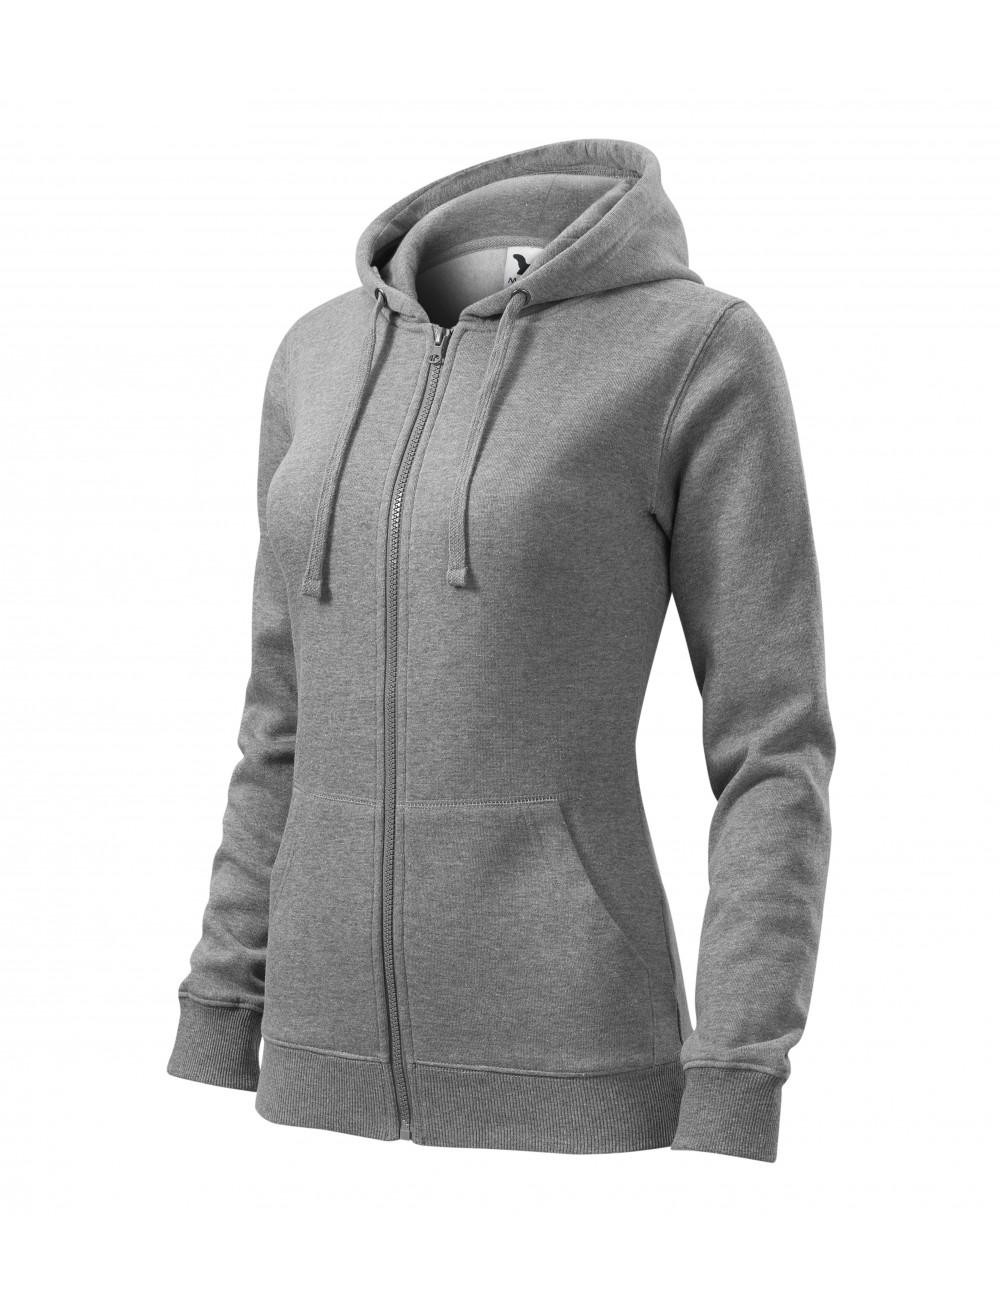 Adler MALFINI Bluza damska Trendy Zipper 411 ciemnoszary melanż